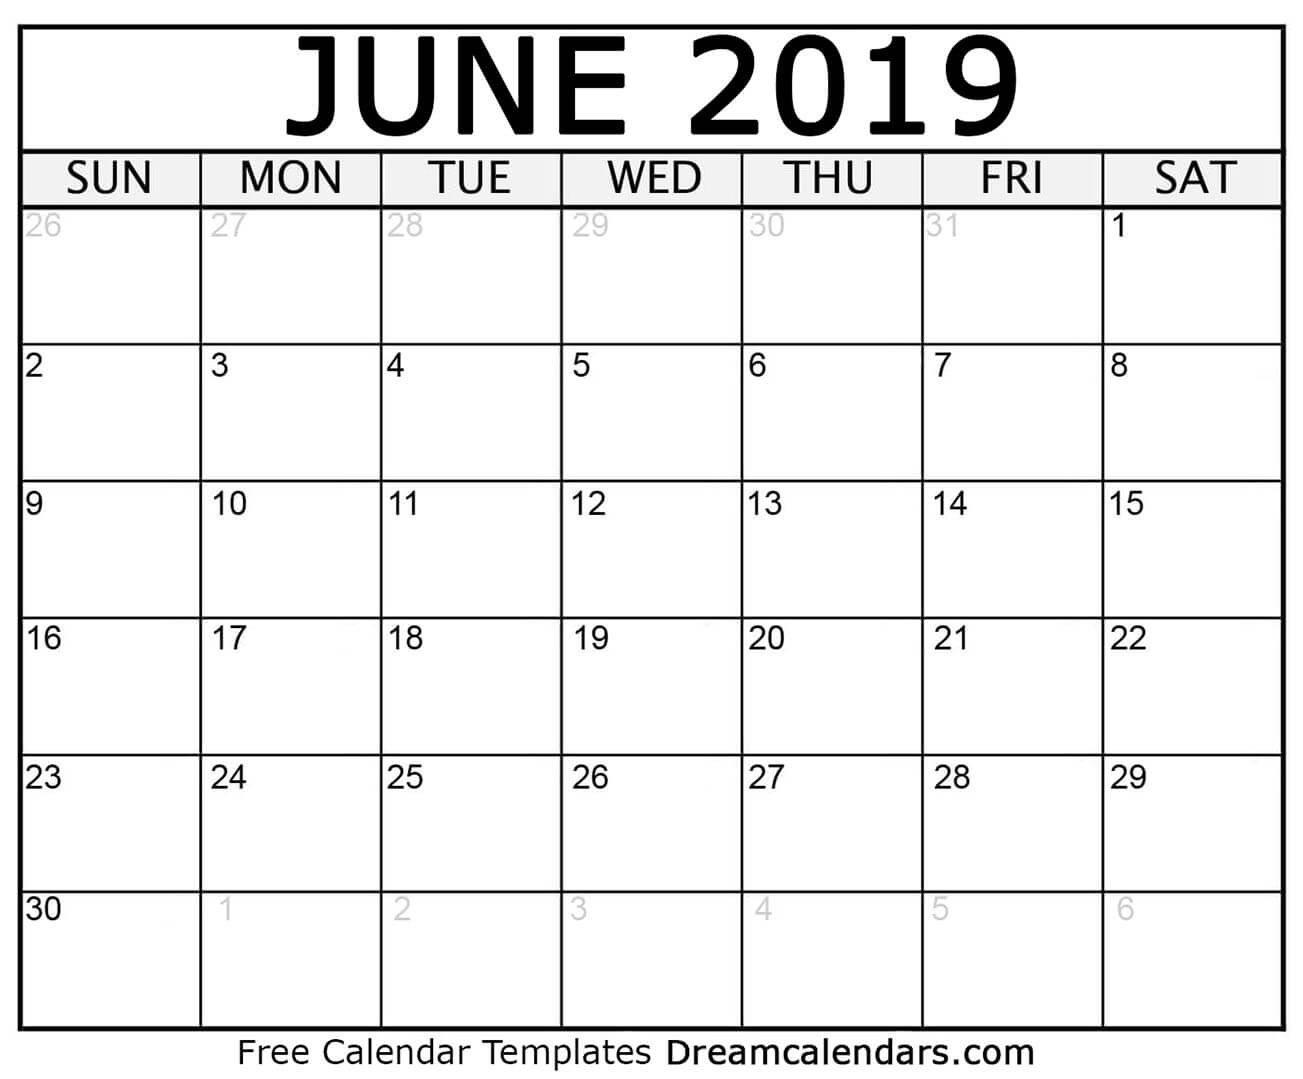 Dream Calendars – Make Your Calendar Template Blog: Blank Printable Calendar 2019 Blog